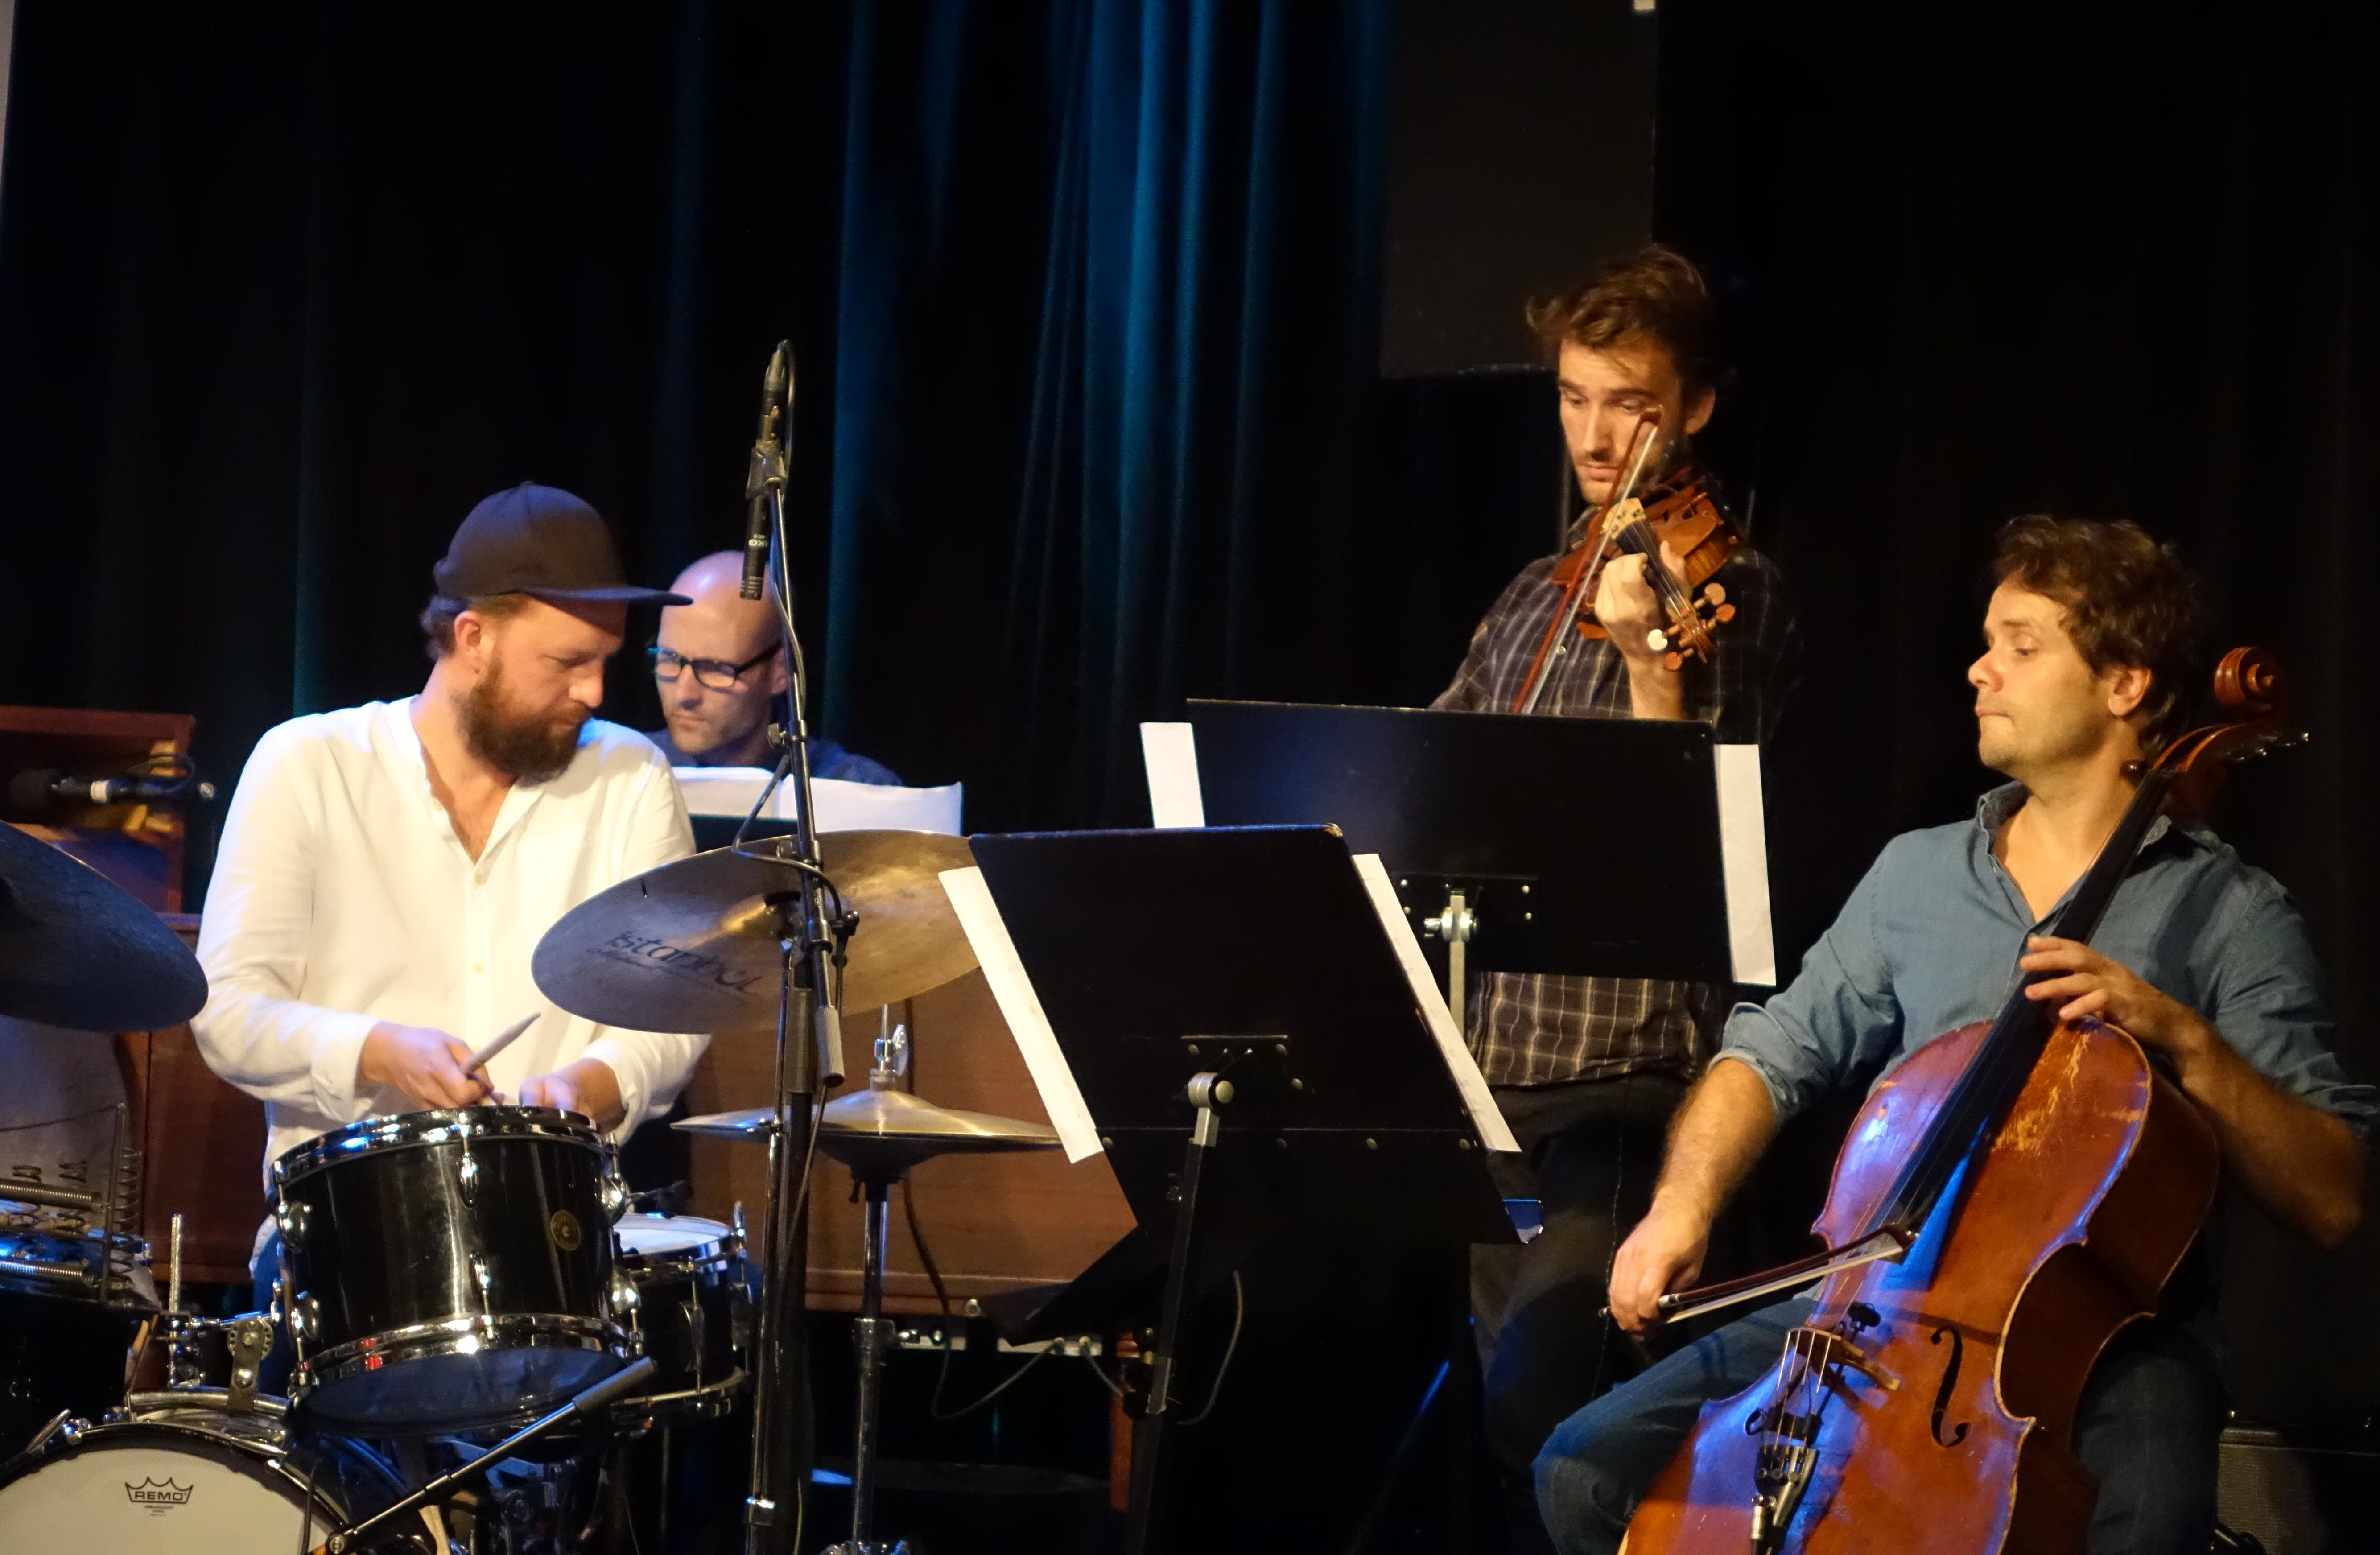 Gard Nilssen, Daniel Formo, Adrian Løseth Waade and Øyvind Engen at Nasjonal Jazzscene Victoria, Oslo in August 2018